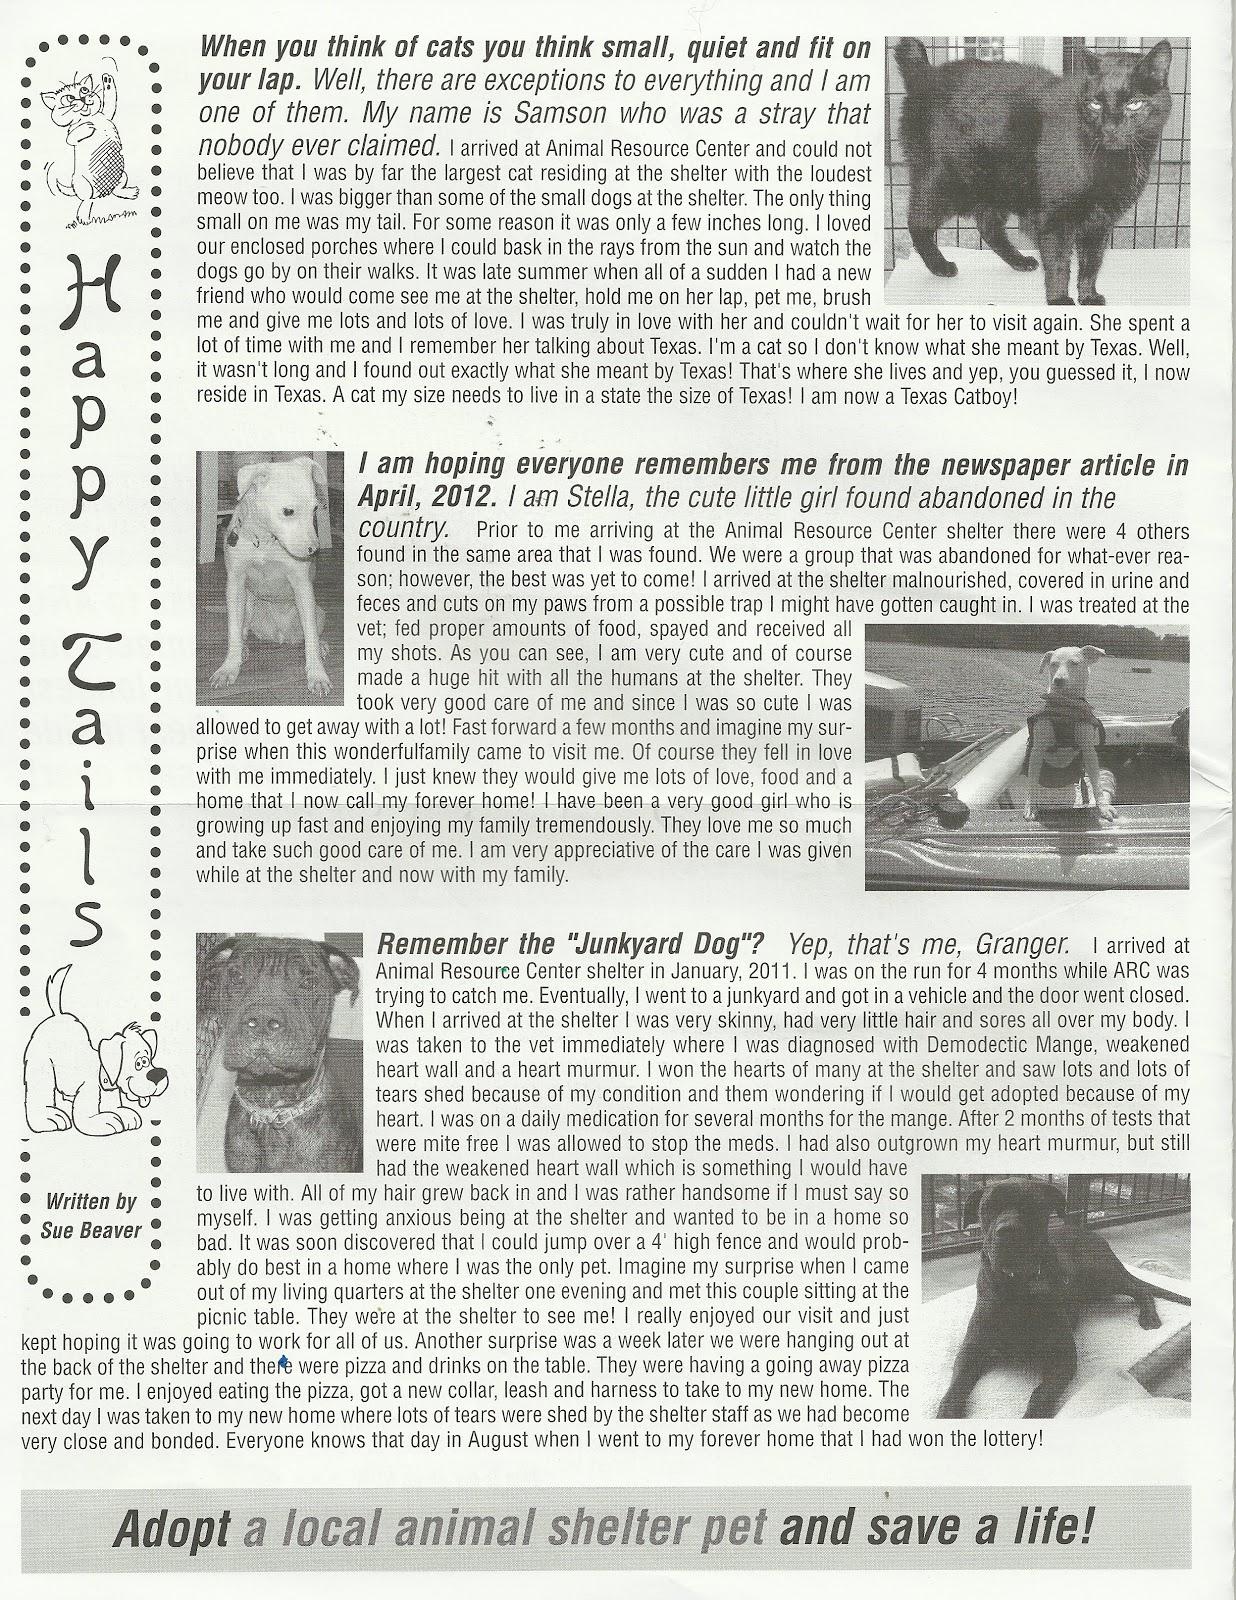 Animal Resource Center News: November 2012